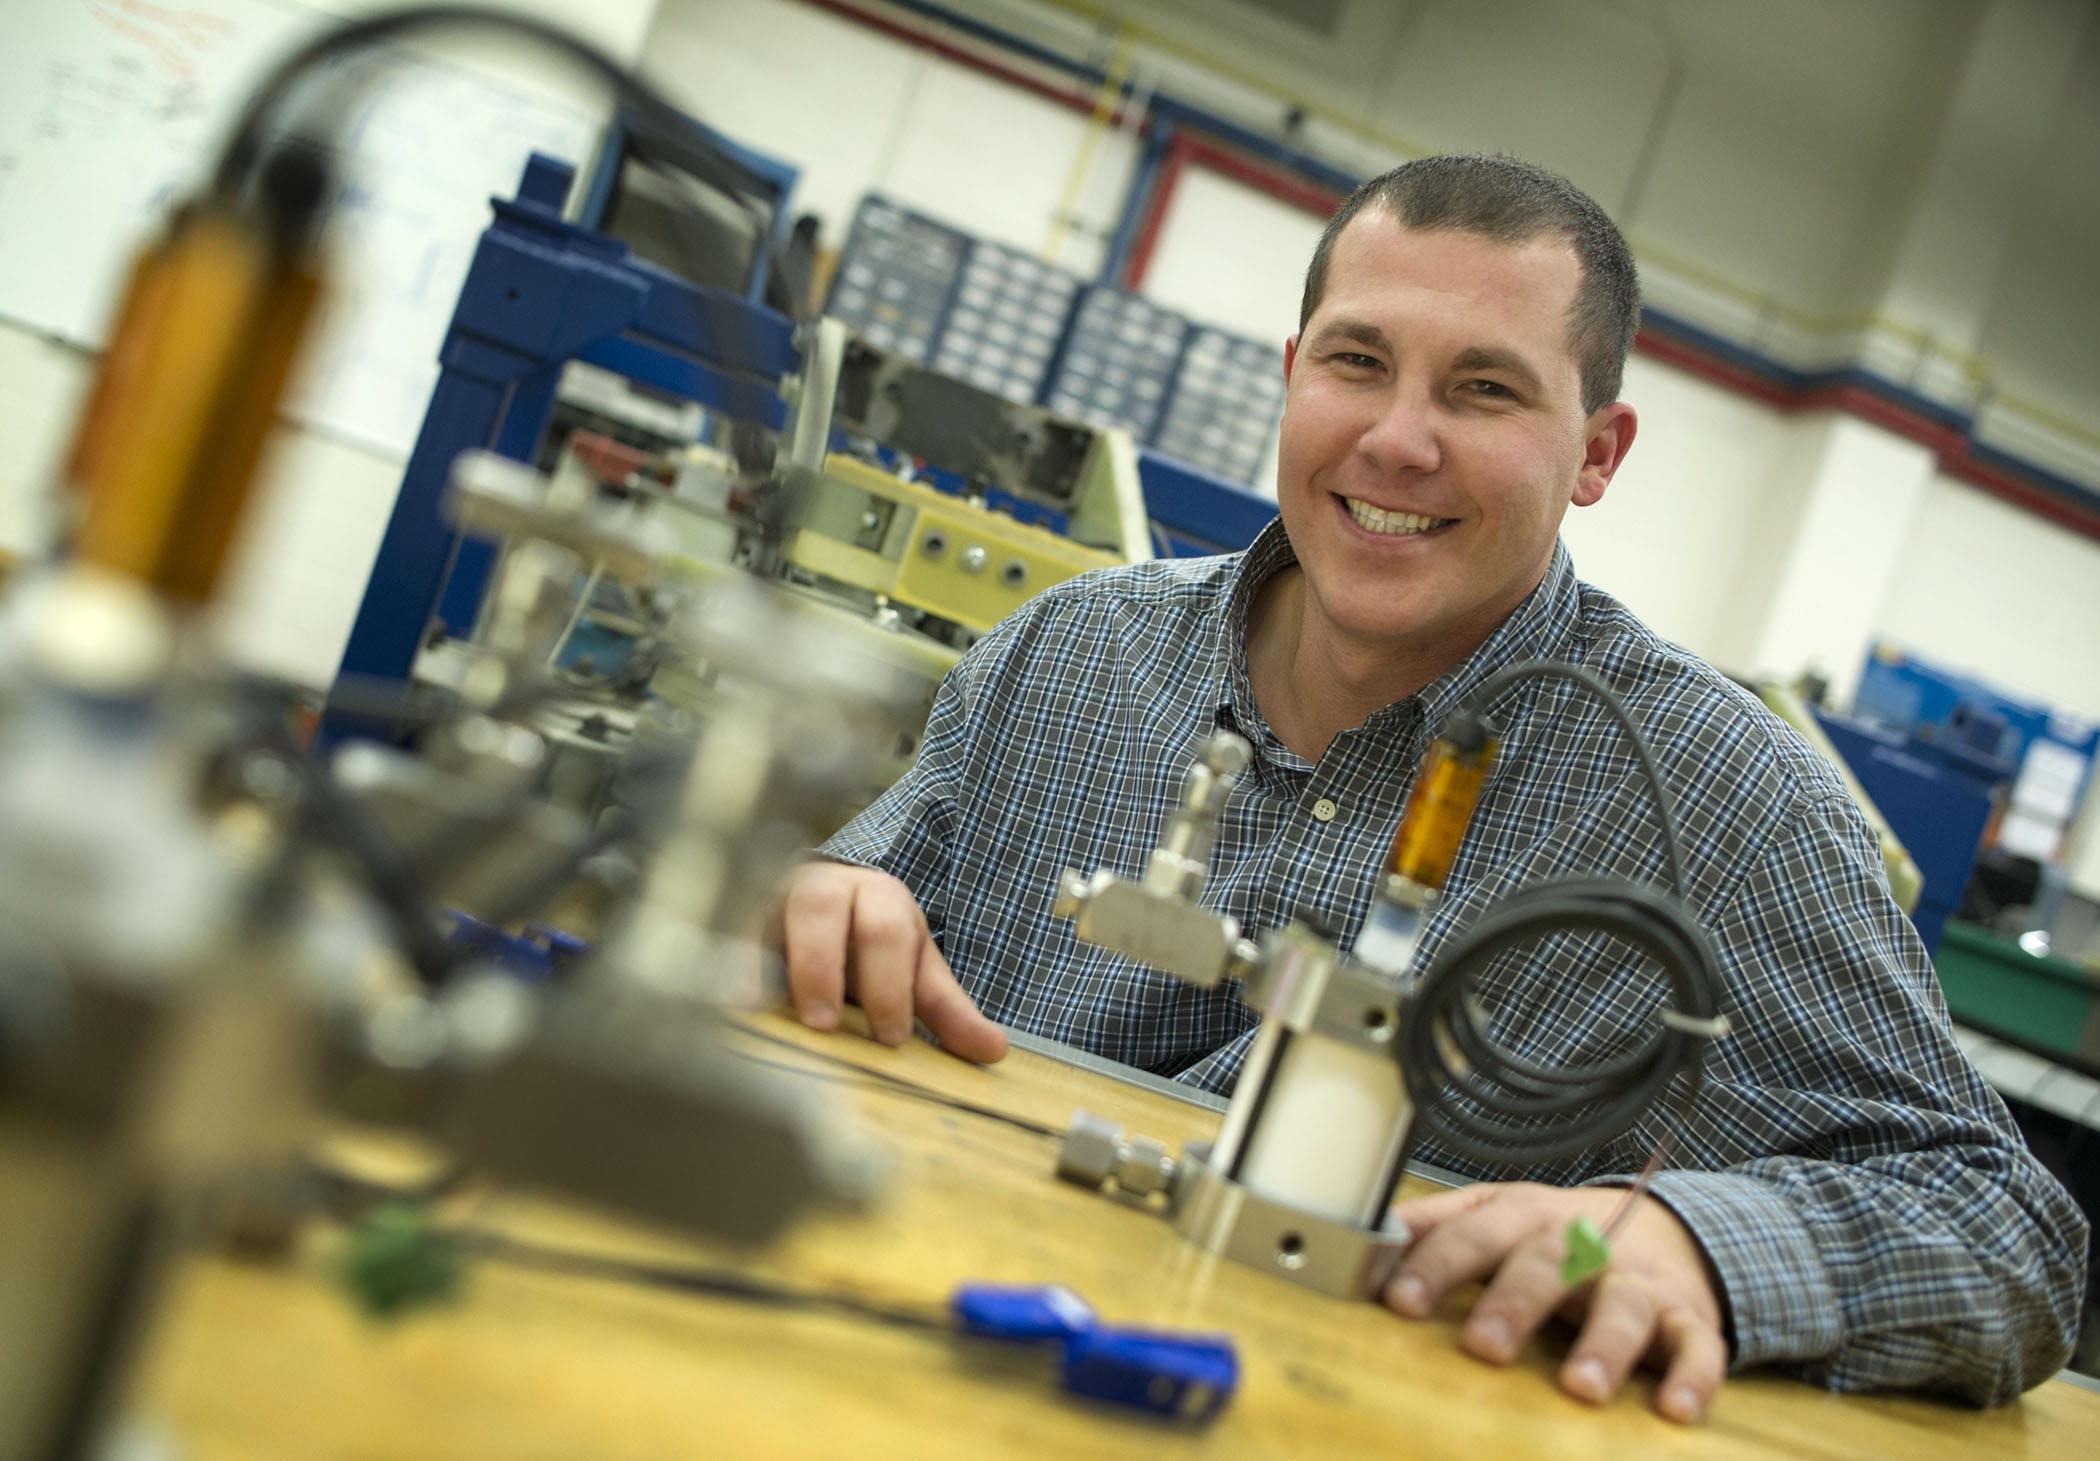 Dr. Devid Wetz, Ph.D., Electrical Engineering